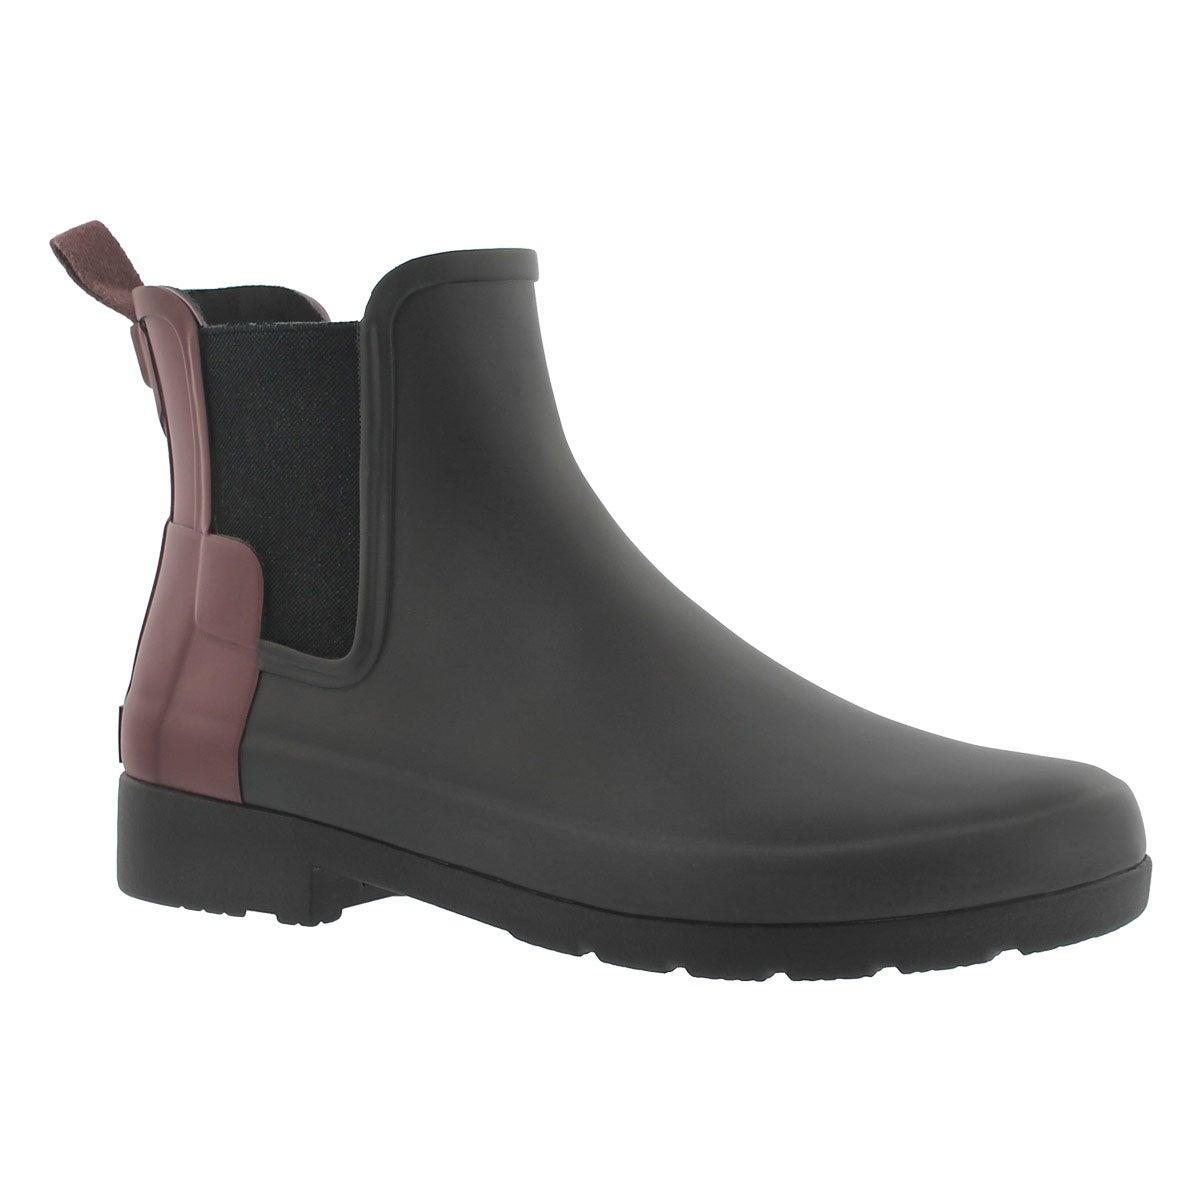 Lds OrgRefinedChelsea blk/dls rainboot